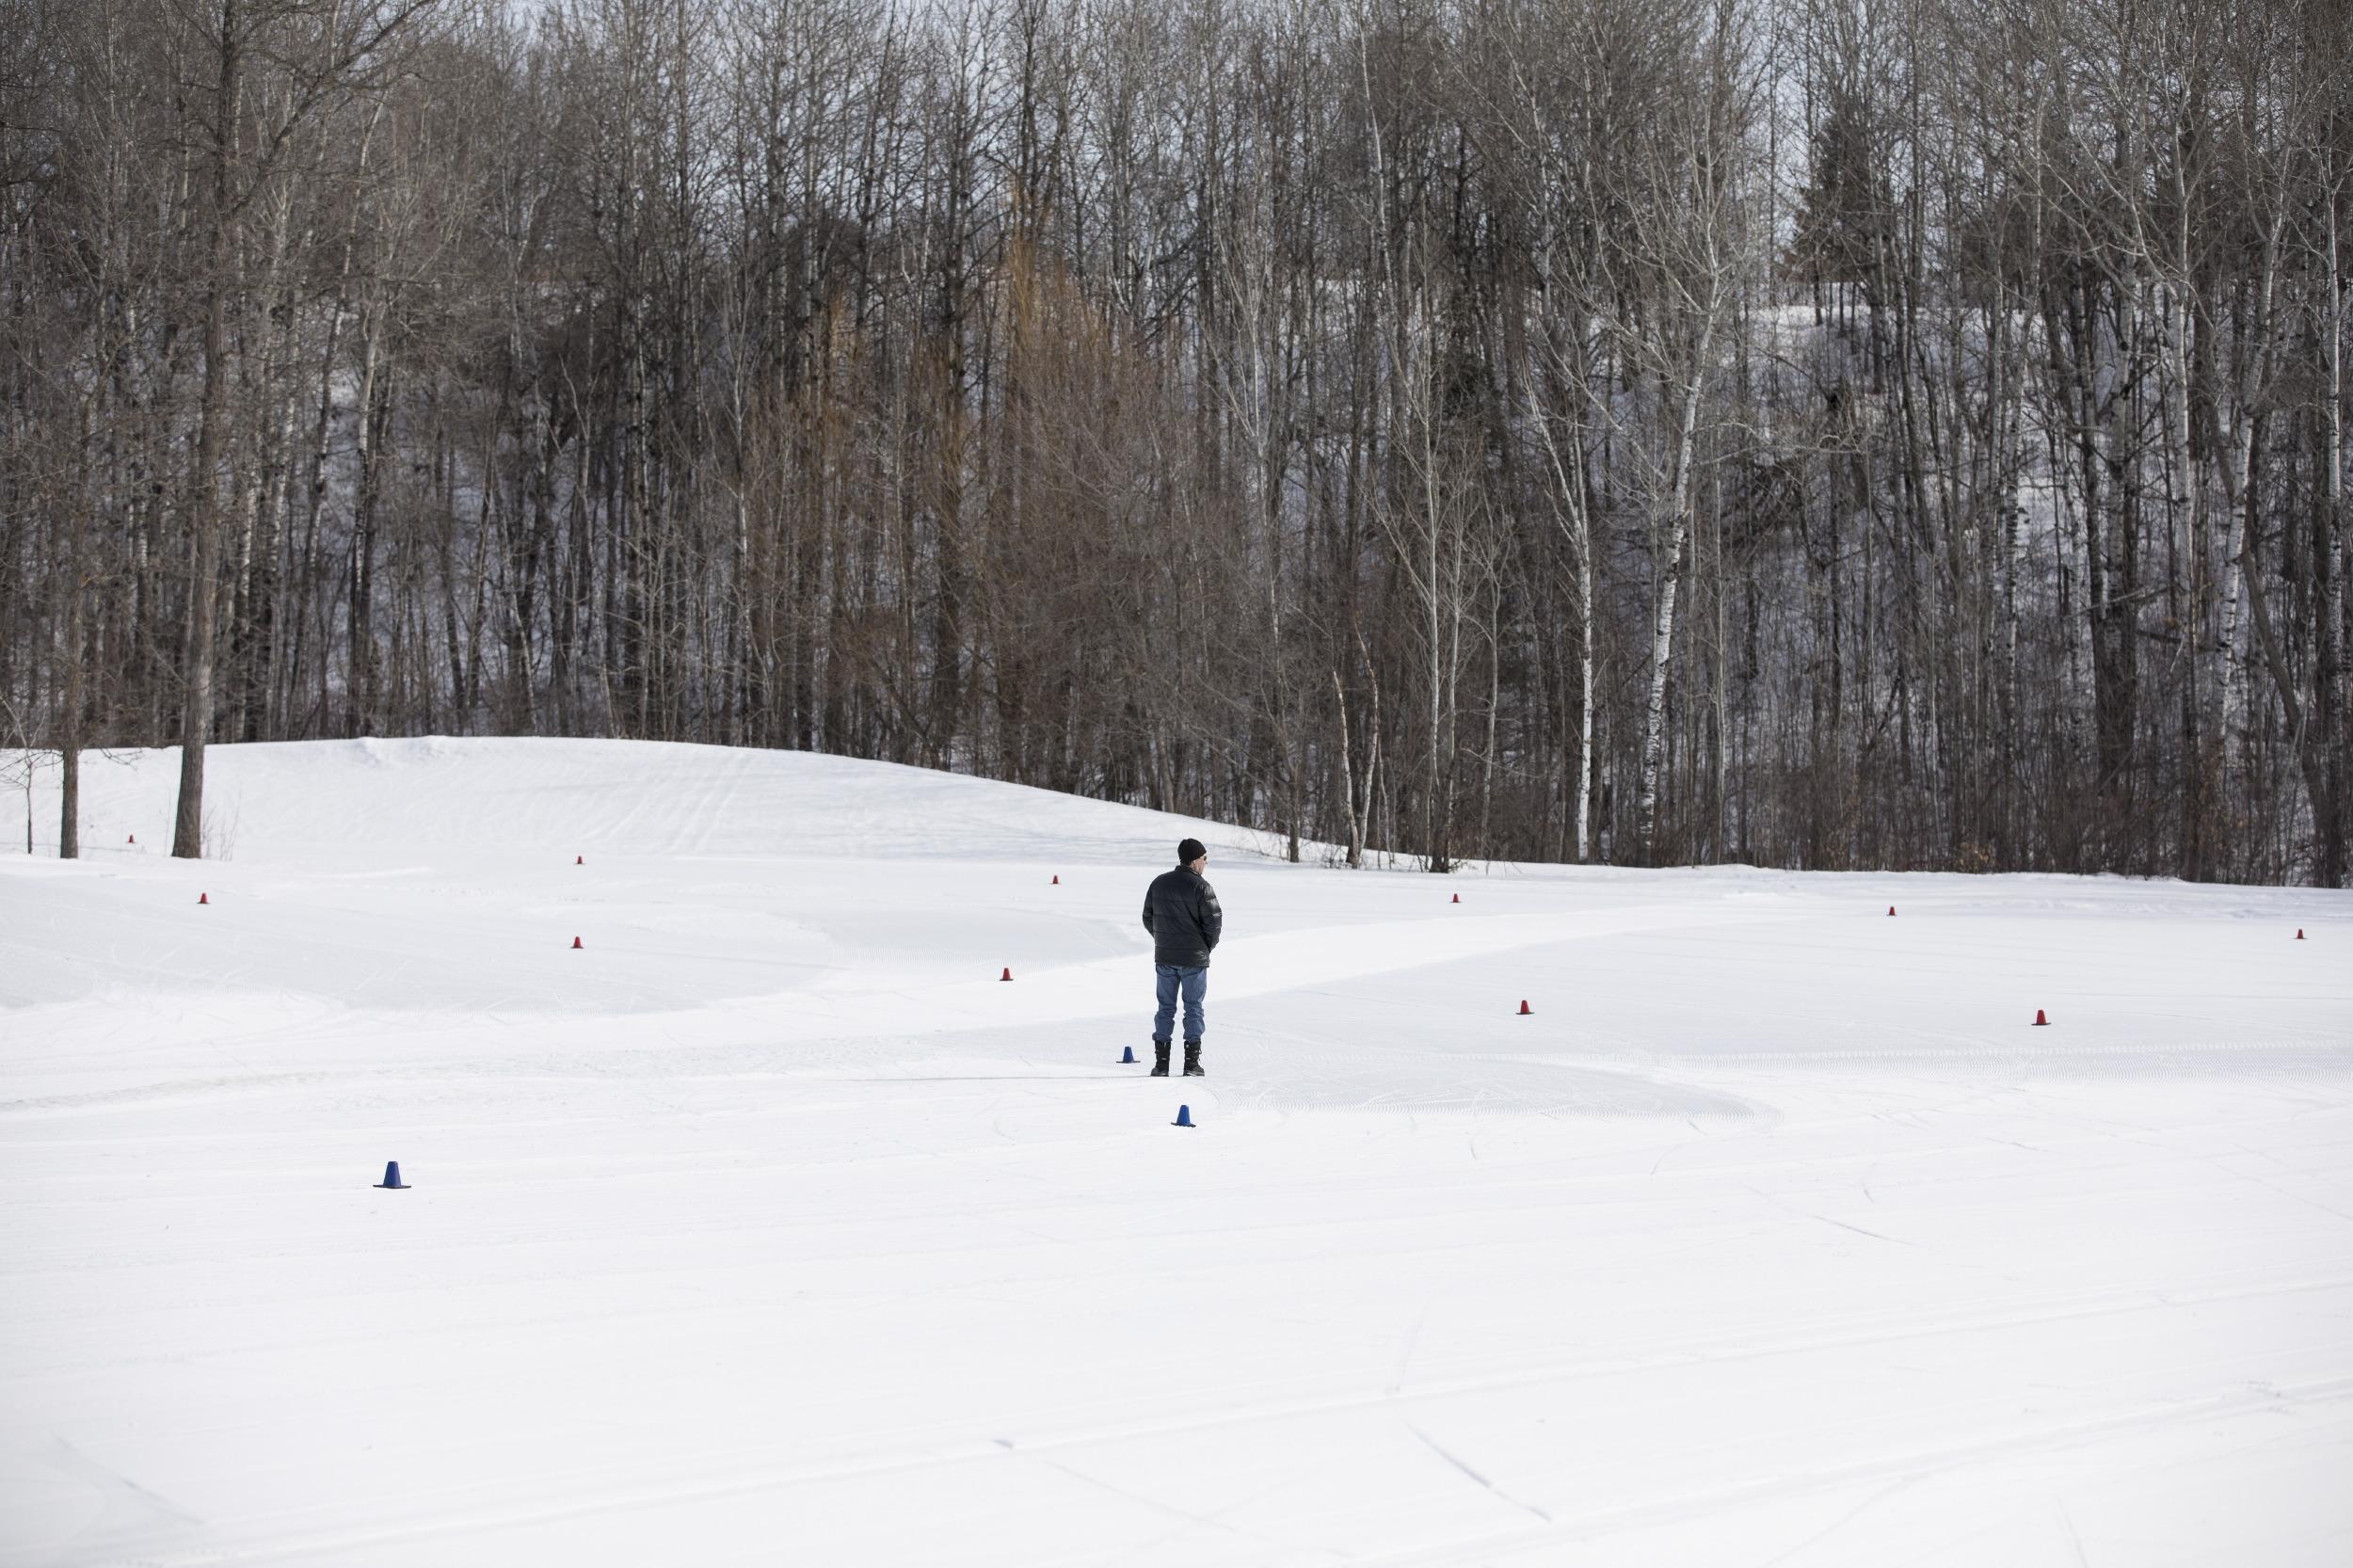 AckermanGruber_Skiing_02.JPG